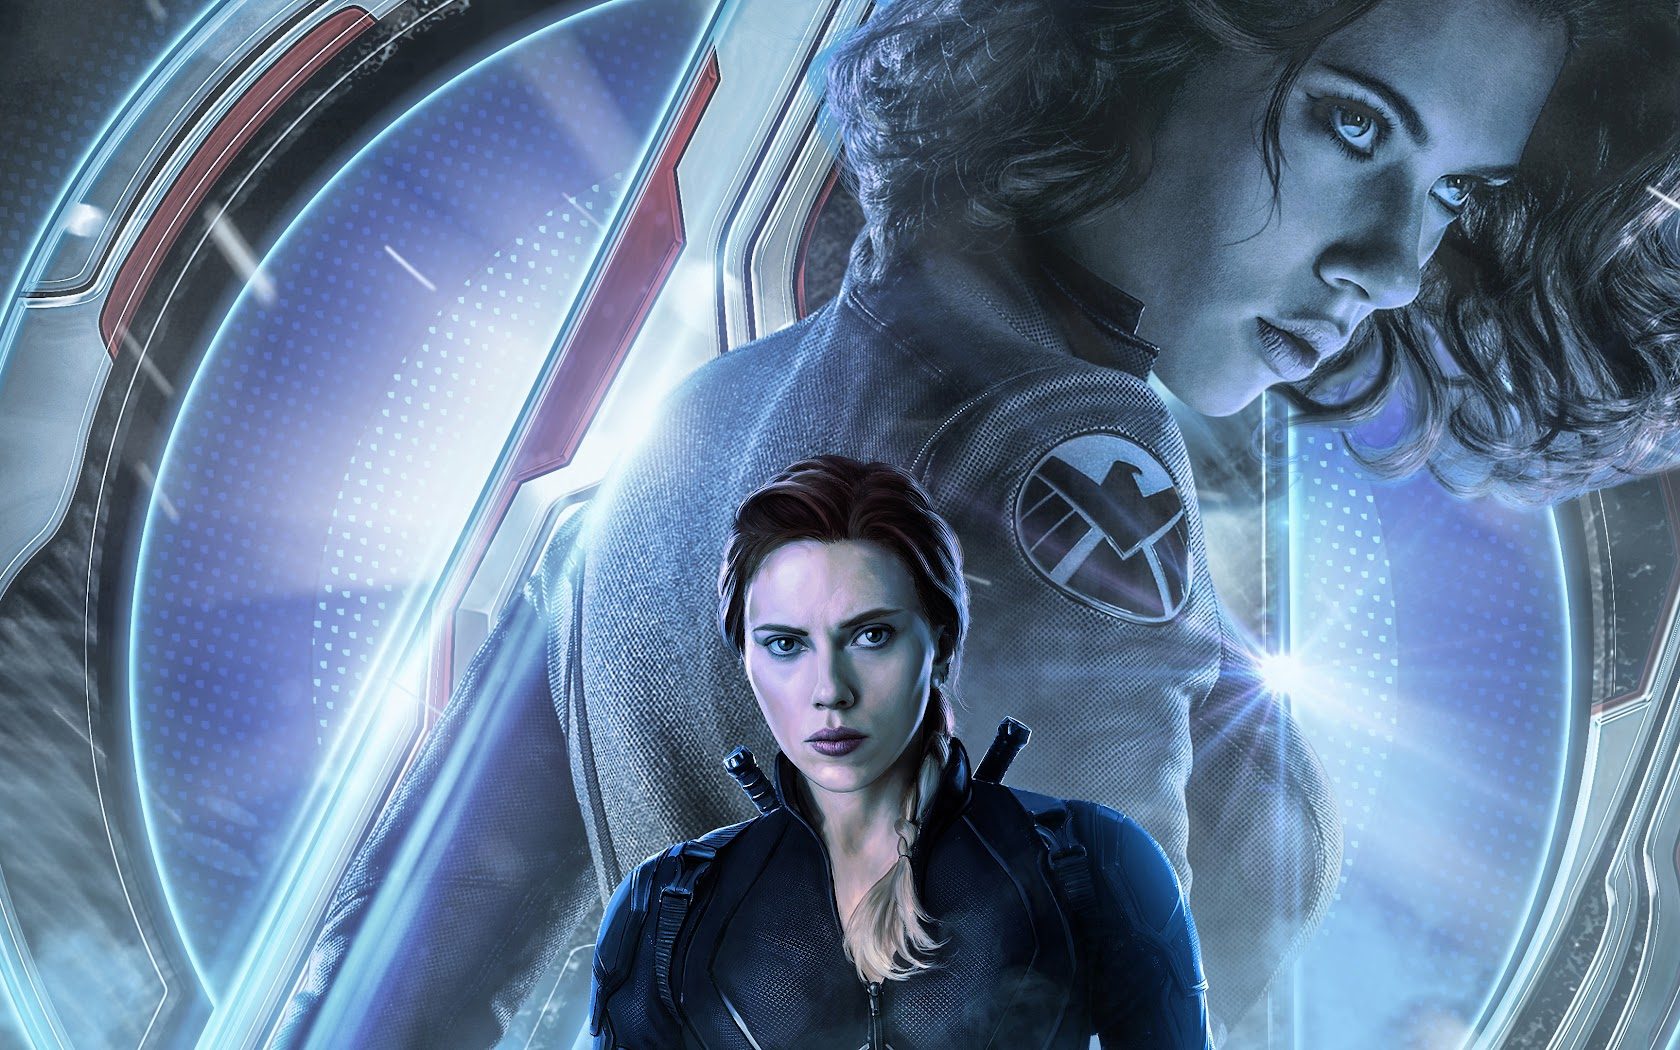 Avengers Endgame Black Widow Natasha Romanoff 4k 108